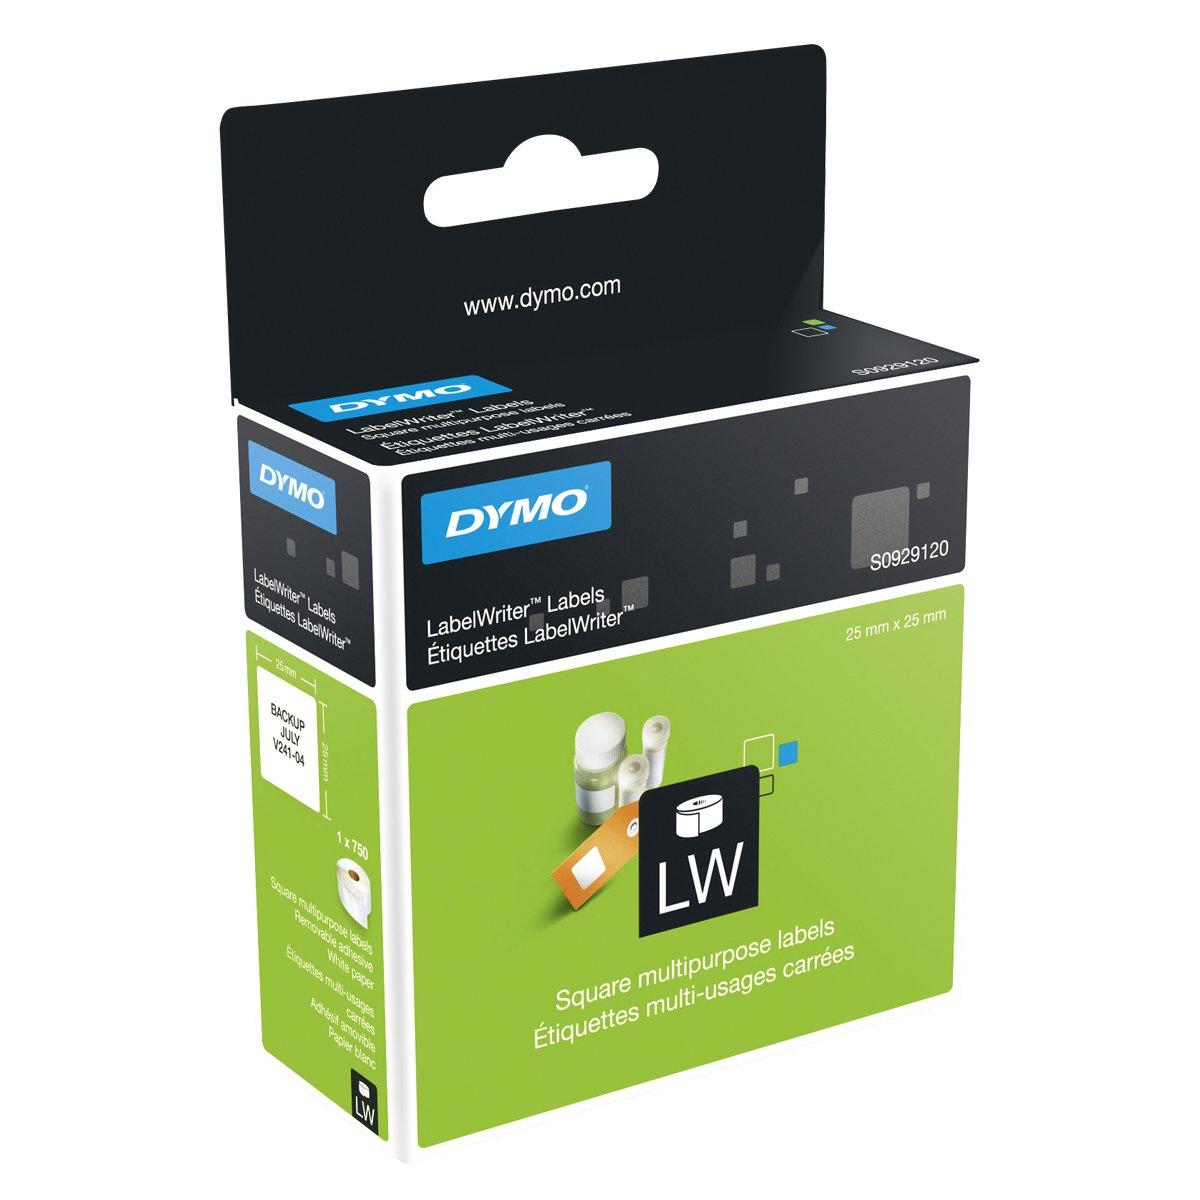 Dymo LabelWriter, etiquetas multiusos autoadhesivas, 13 x 25 mm, (rollo de 1000), impresión negra sobre fondo blanco, S0722530 55833NR